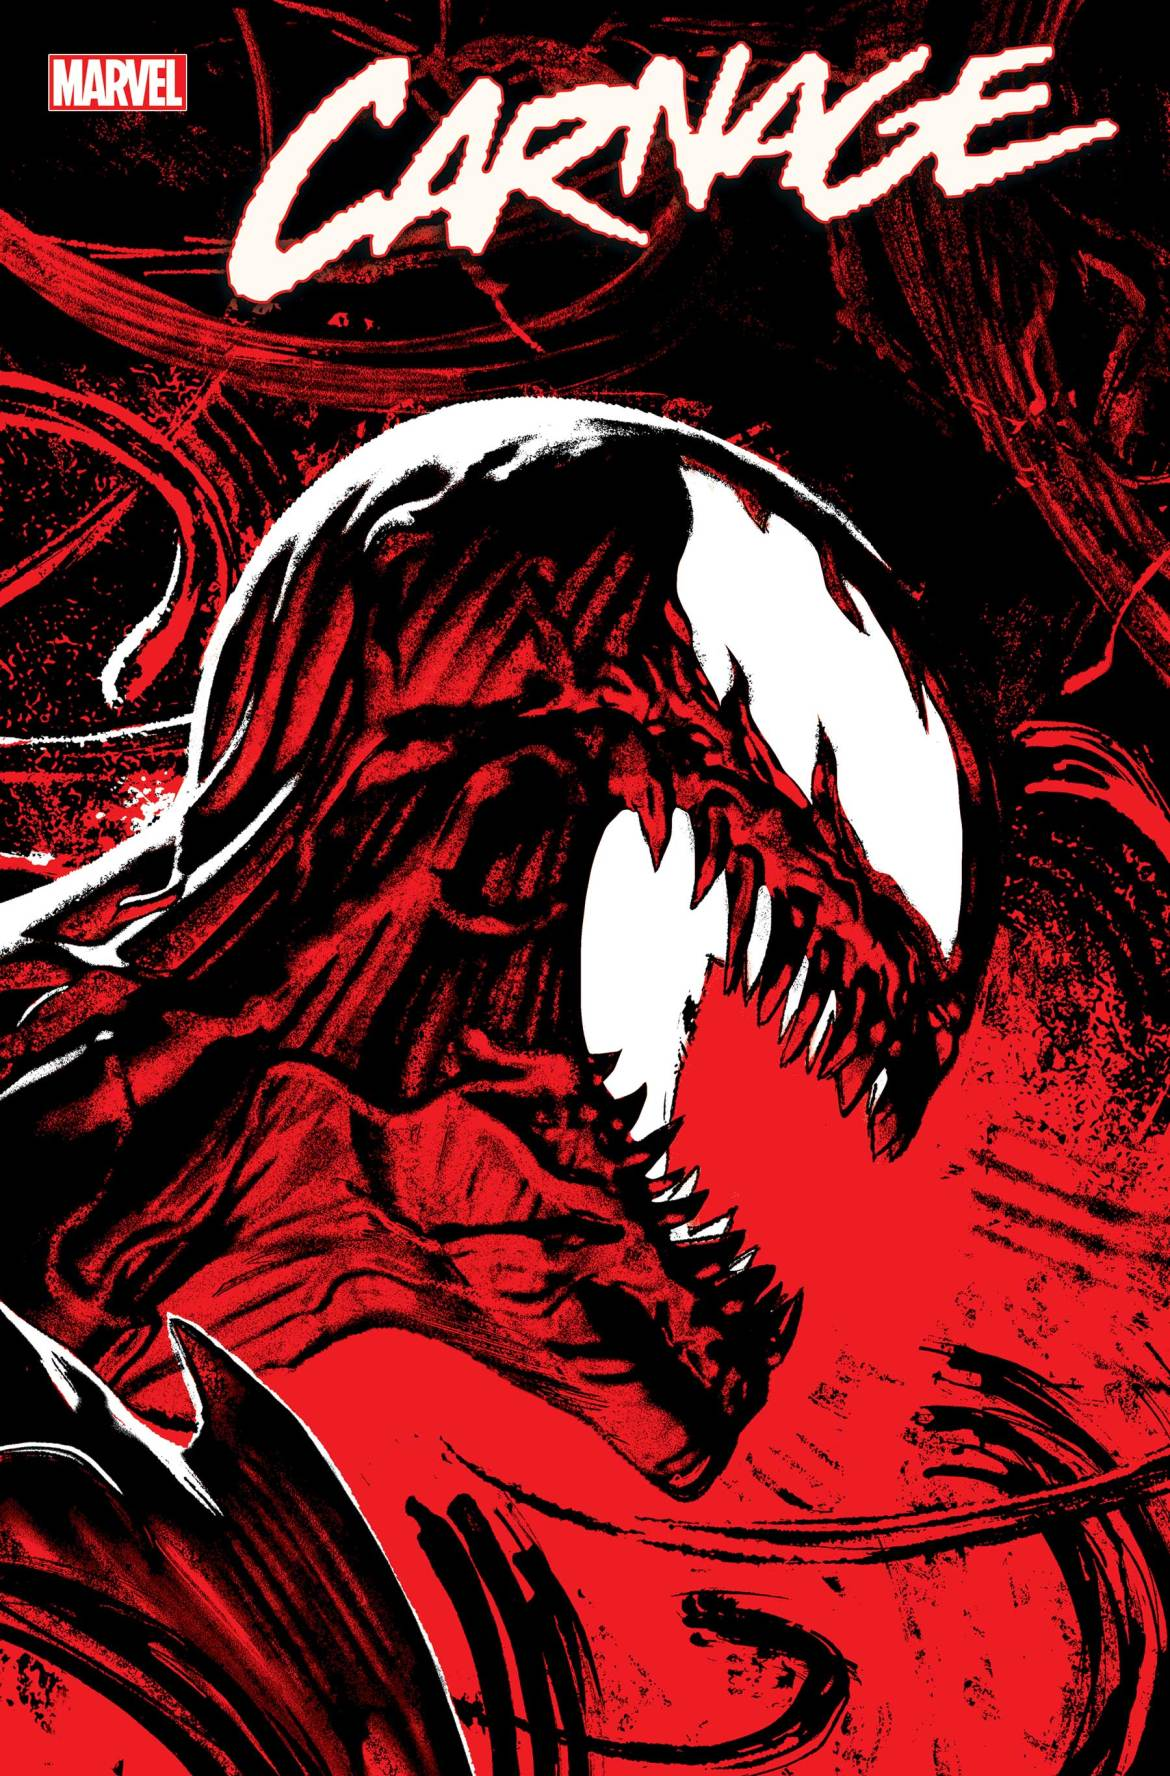 CARNAGEBWB2021003_Cov Marvel Comics May 2021 Solicitations